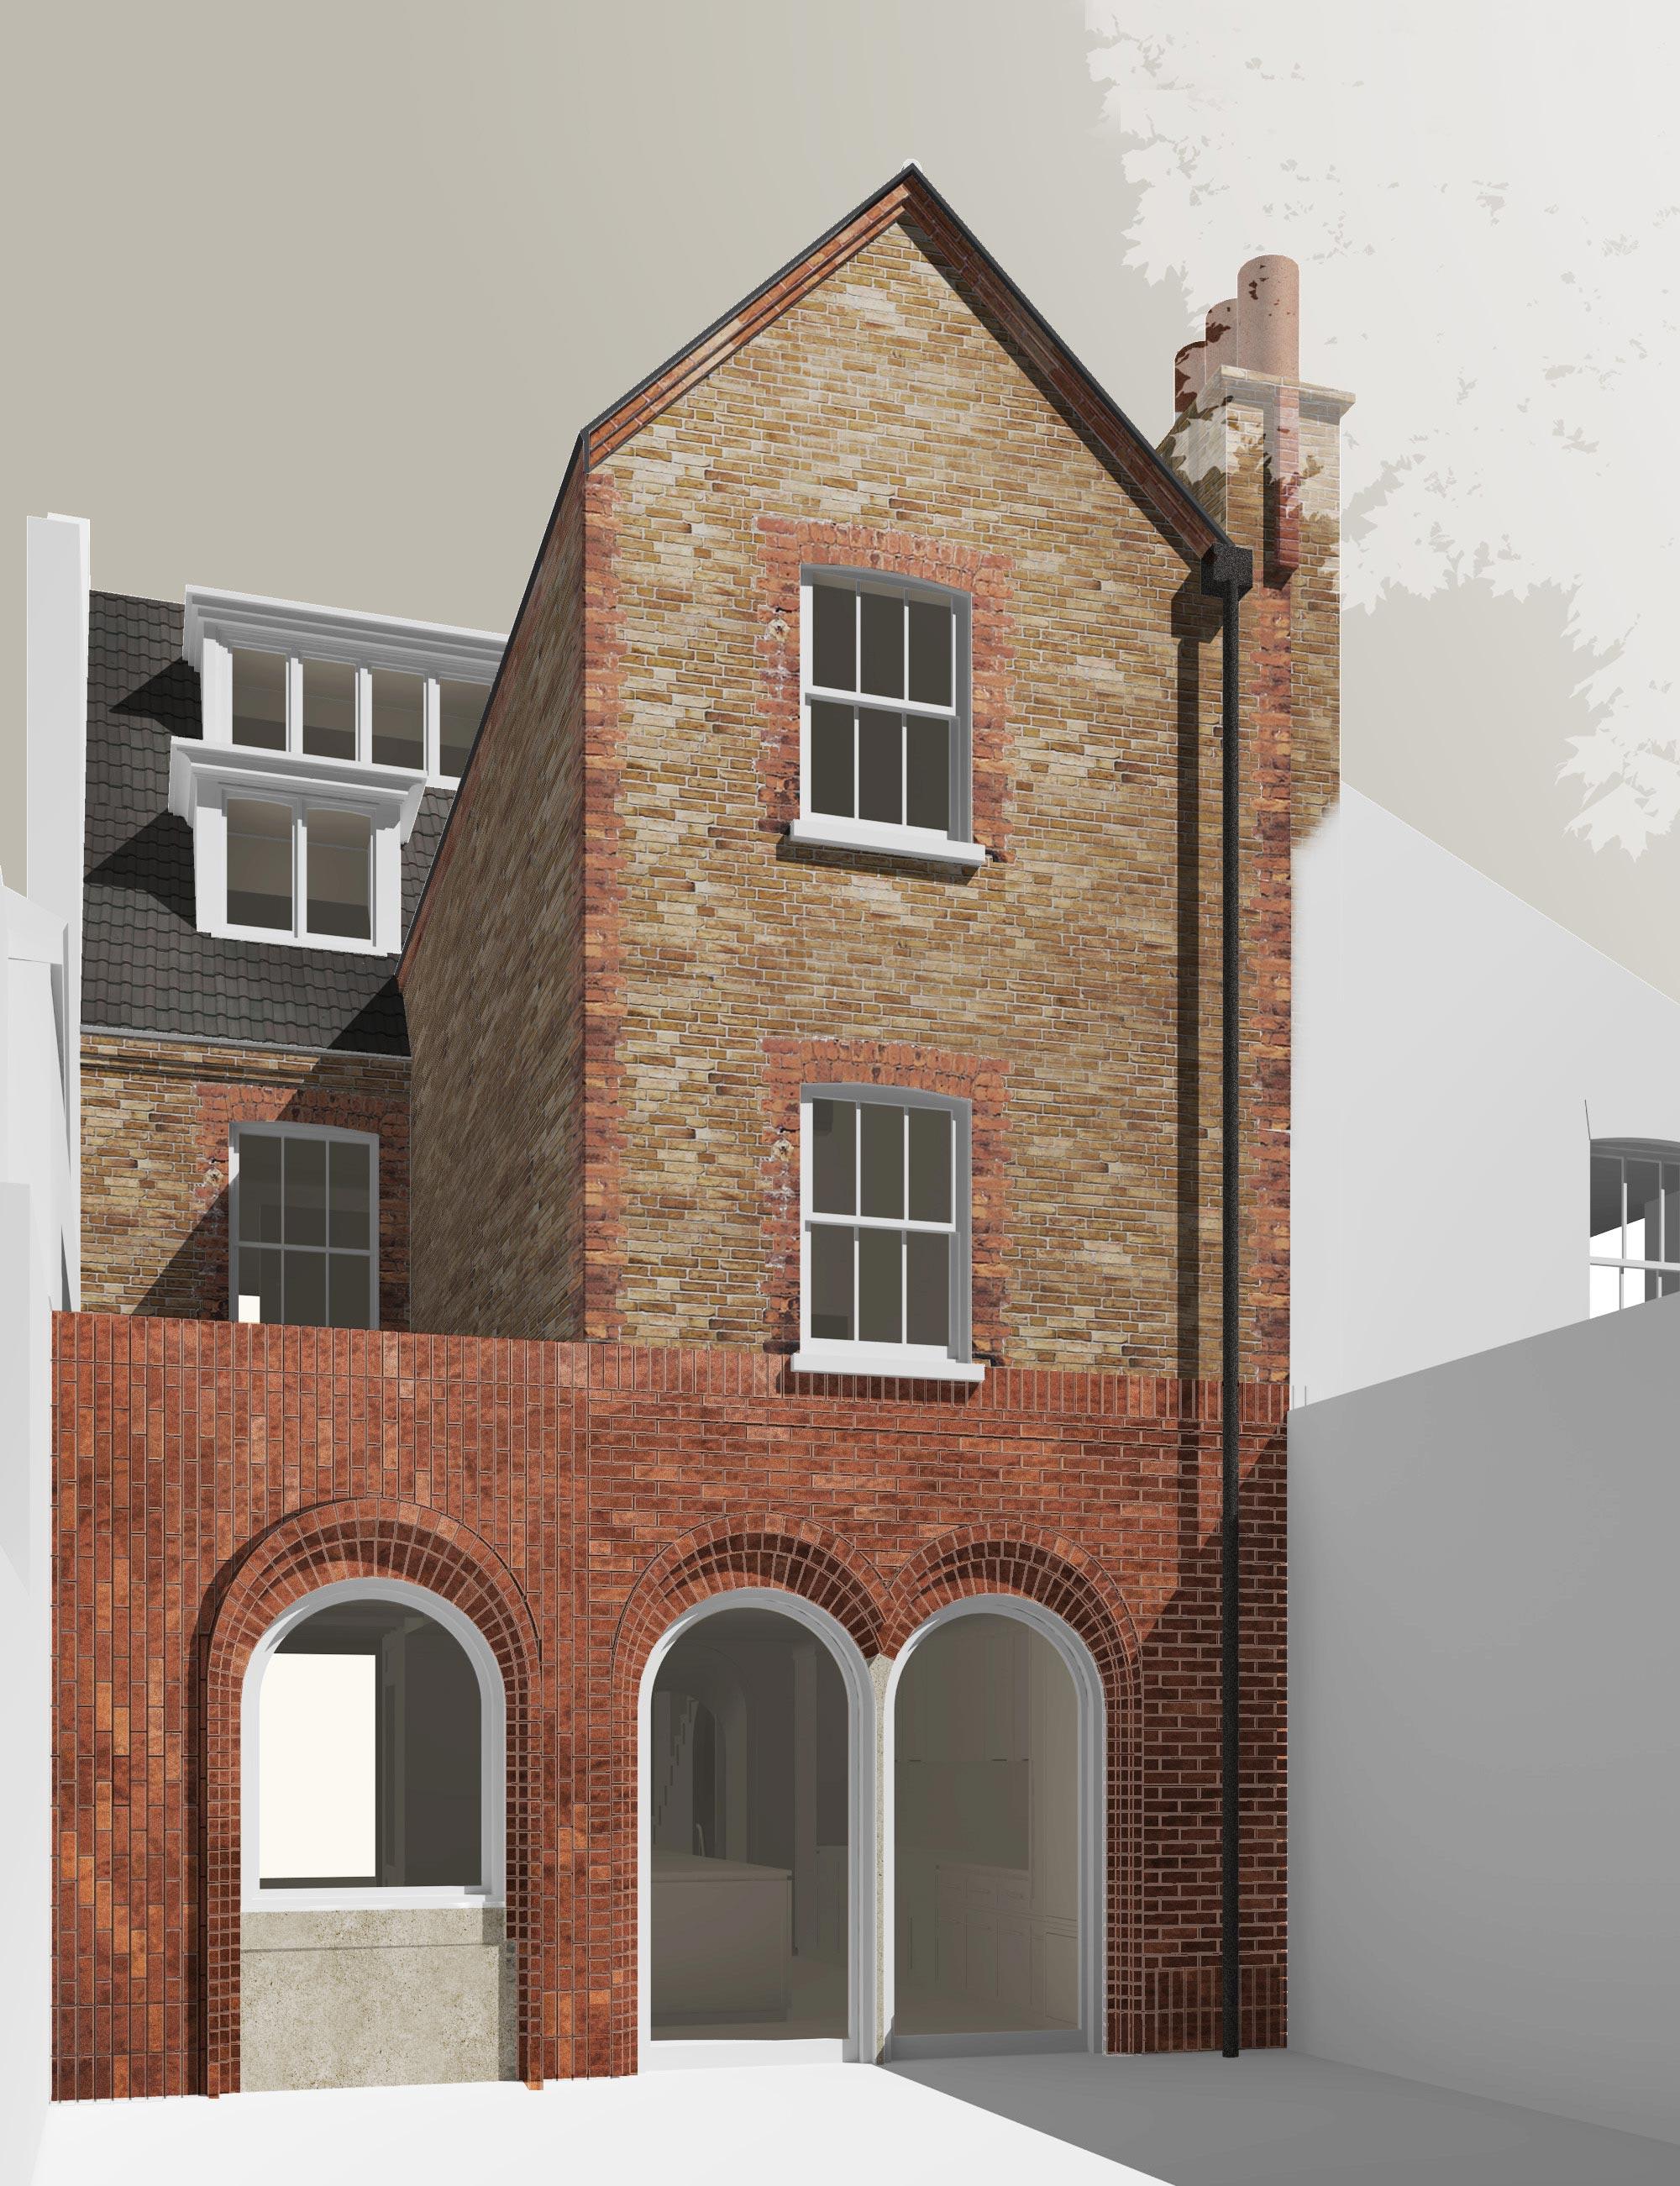 Arch-House-Rear-Elevation.jpg